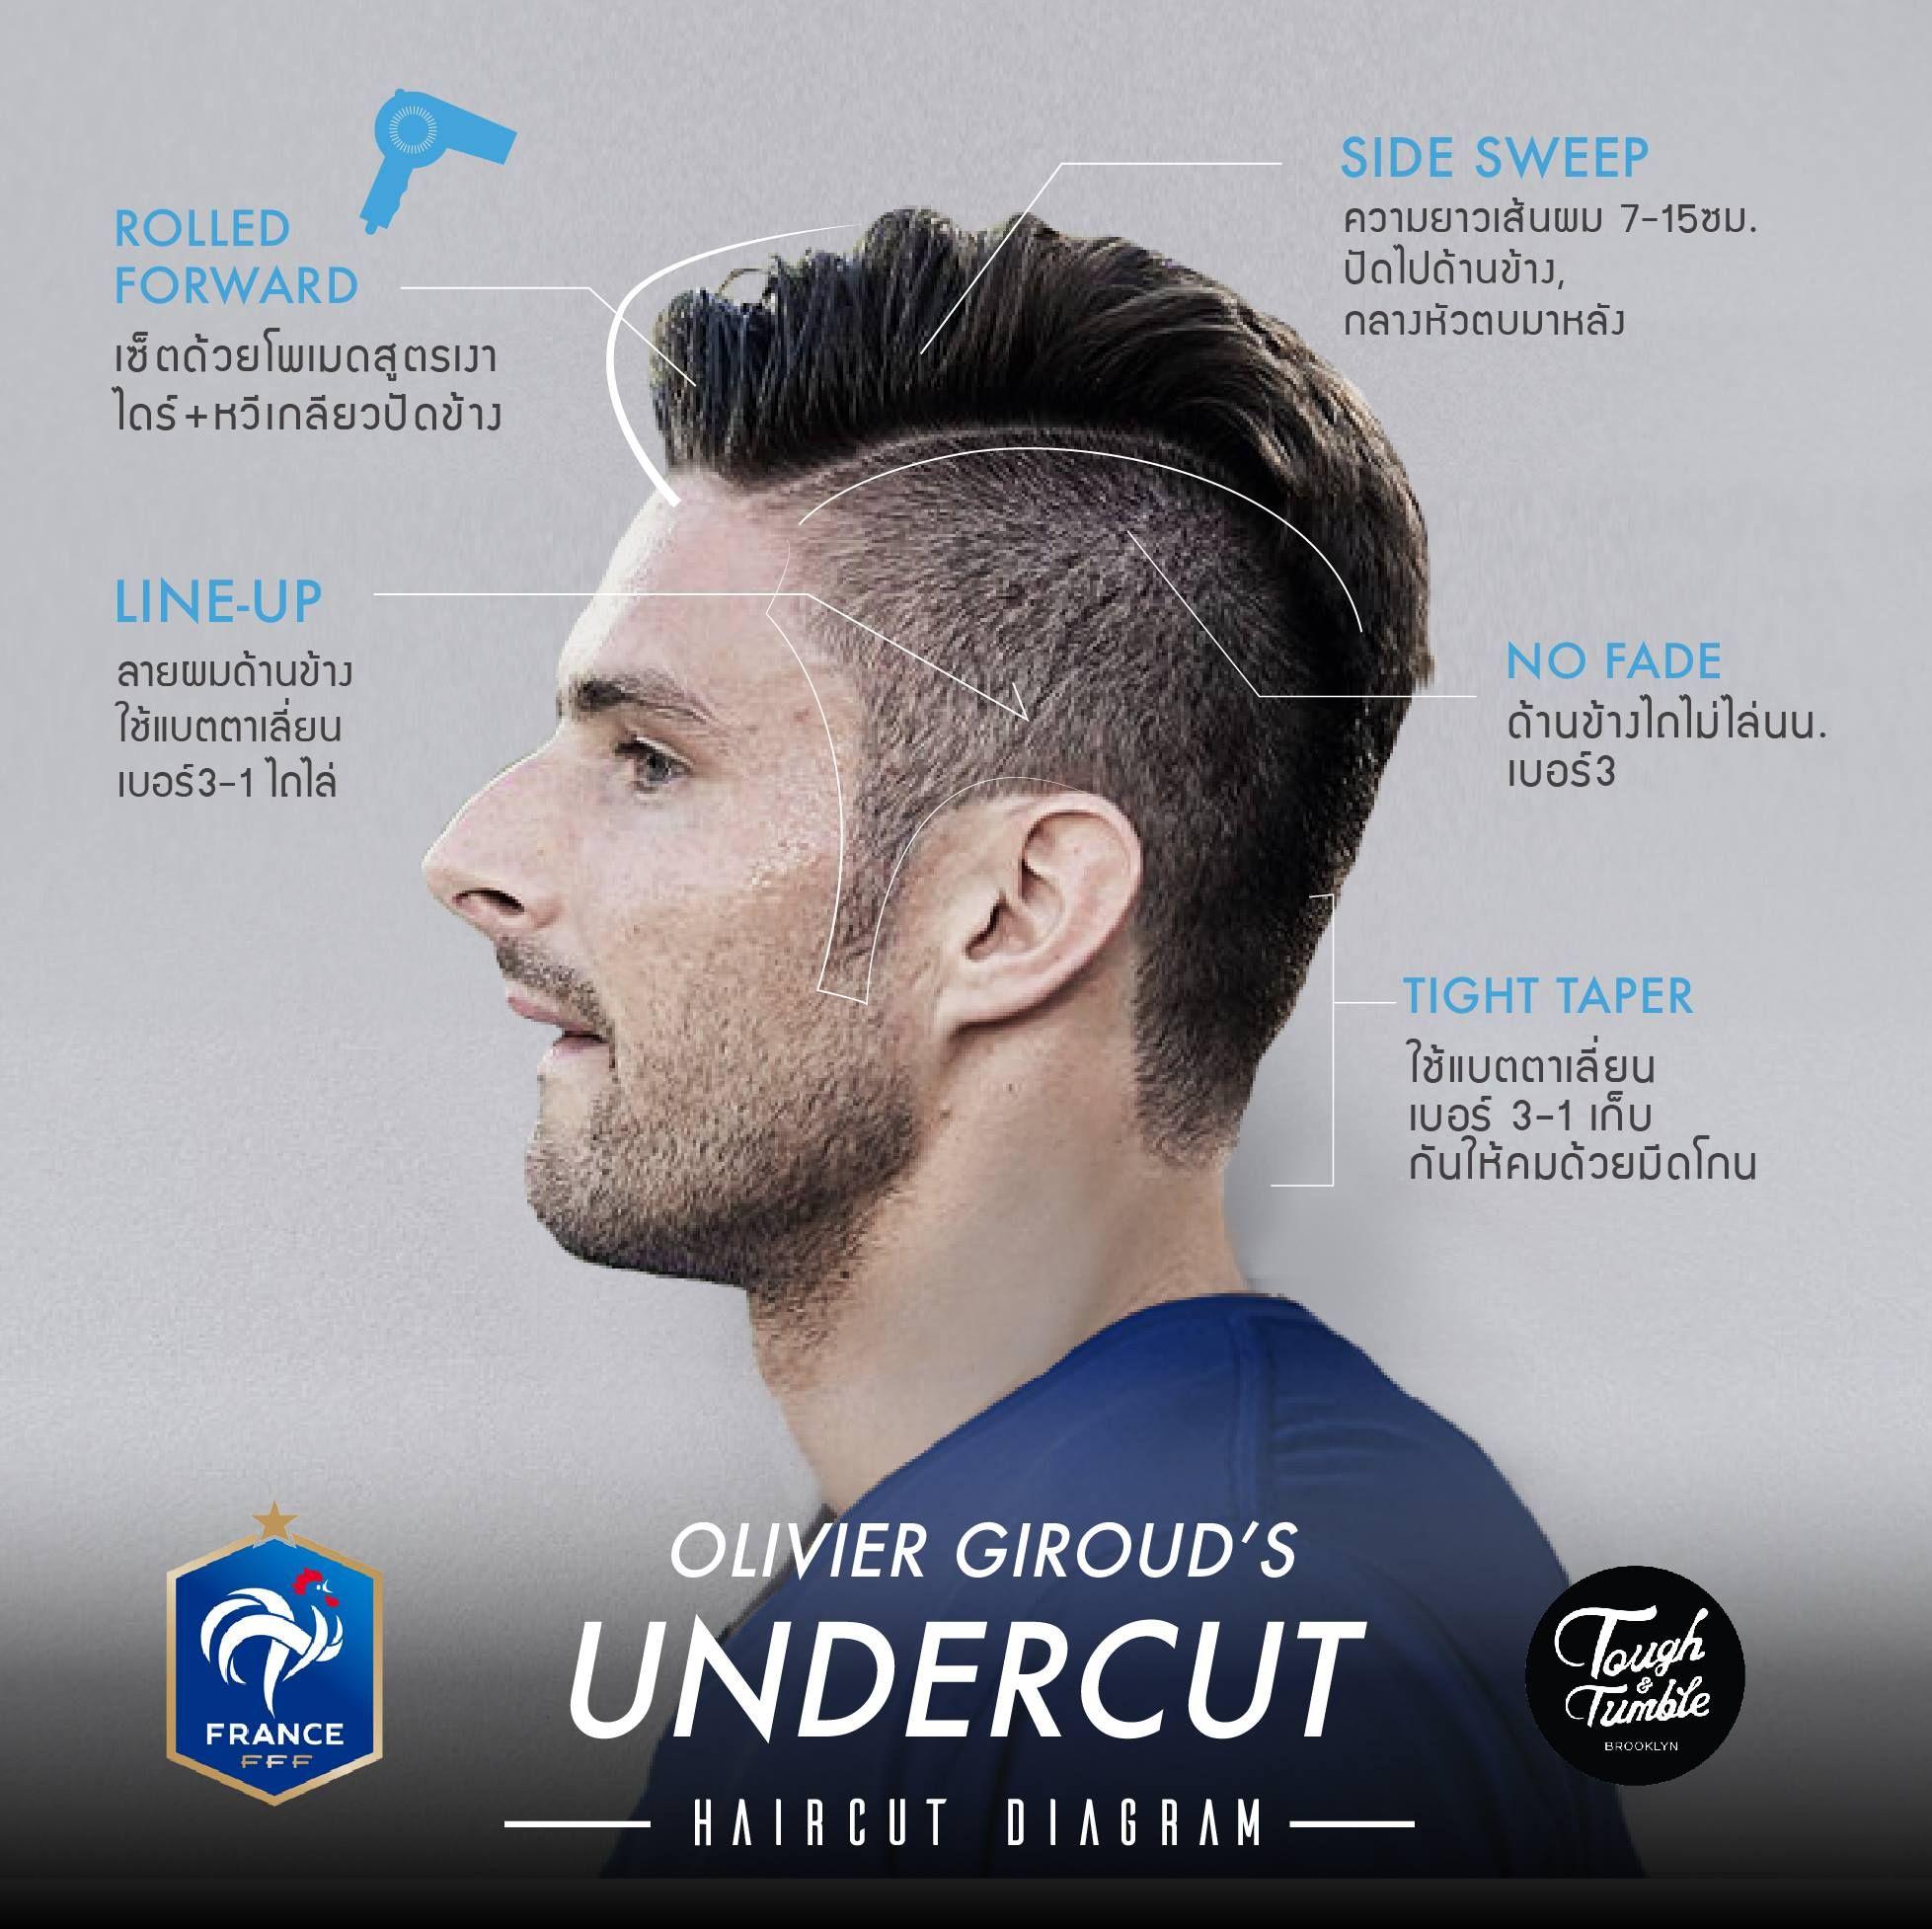 Number 3 Fade Haircut Diagram Online Schematic Diagram